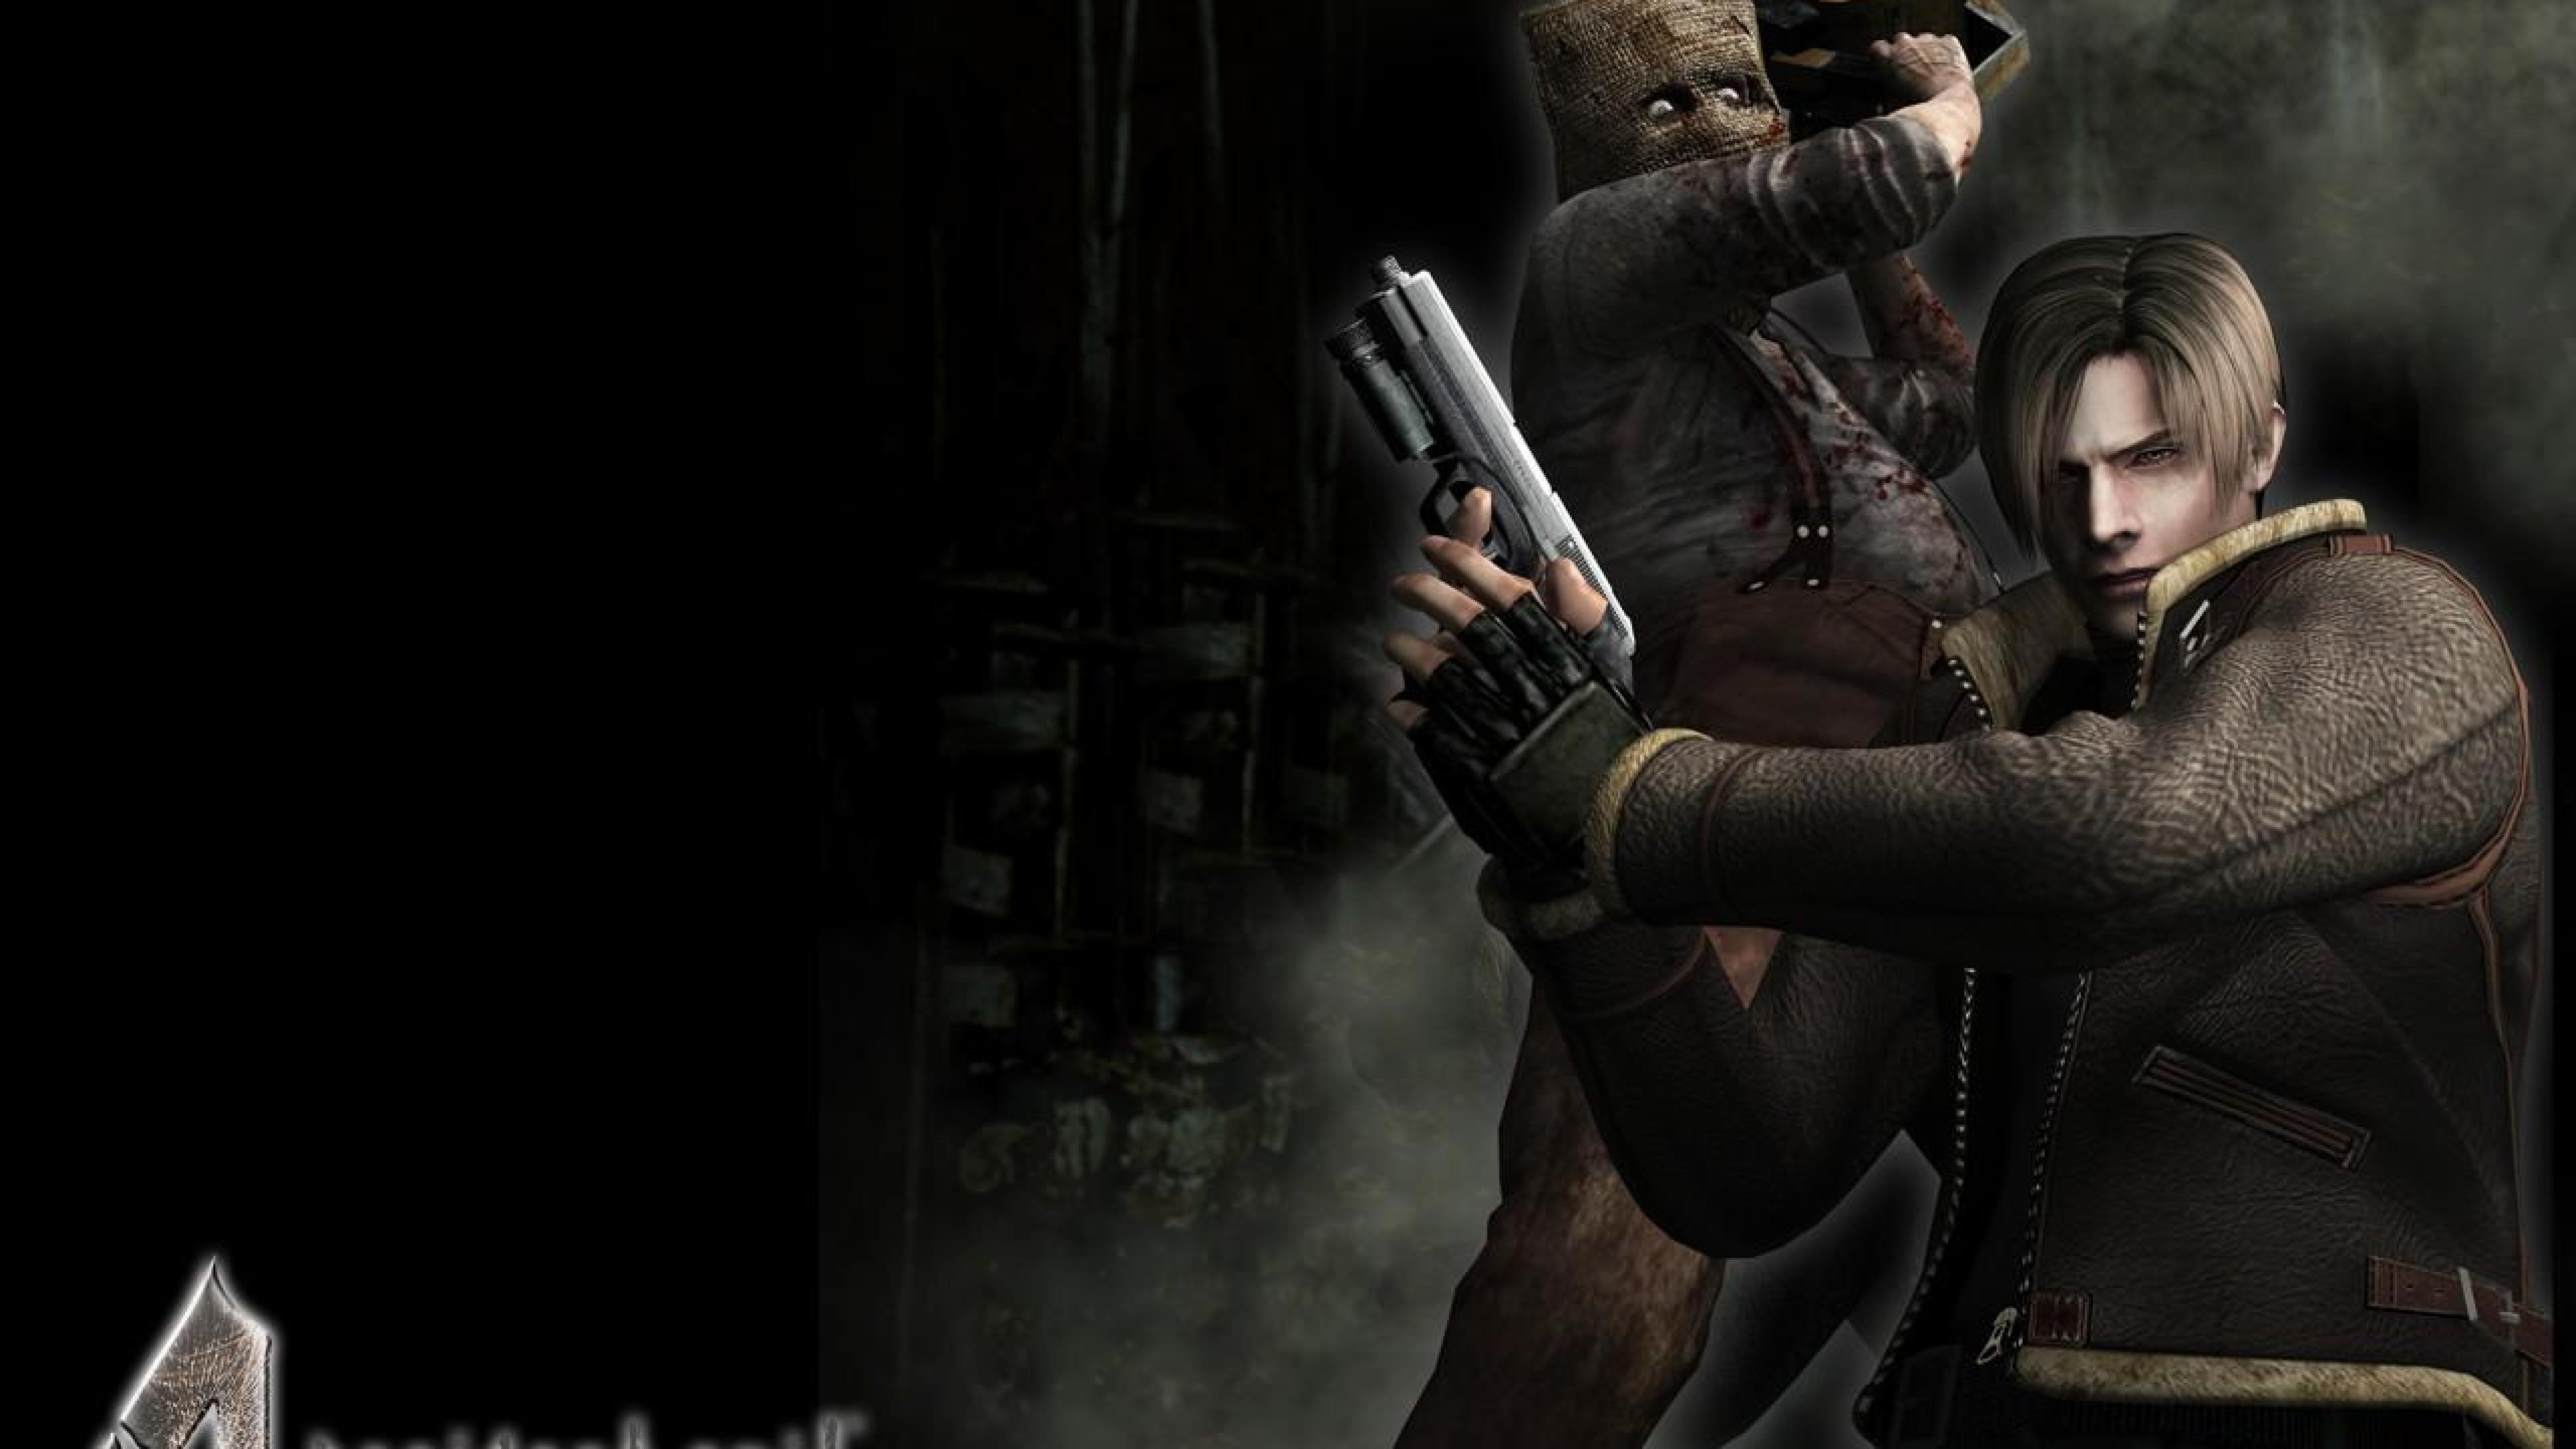 Download Wallpaper Resident Evil Characters Girl Resident